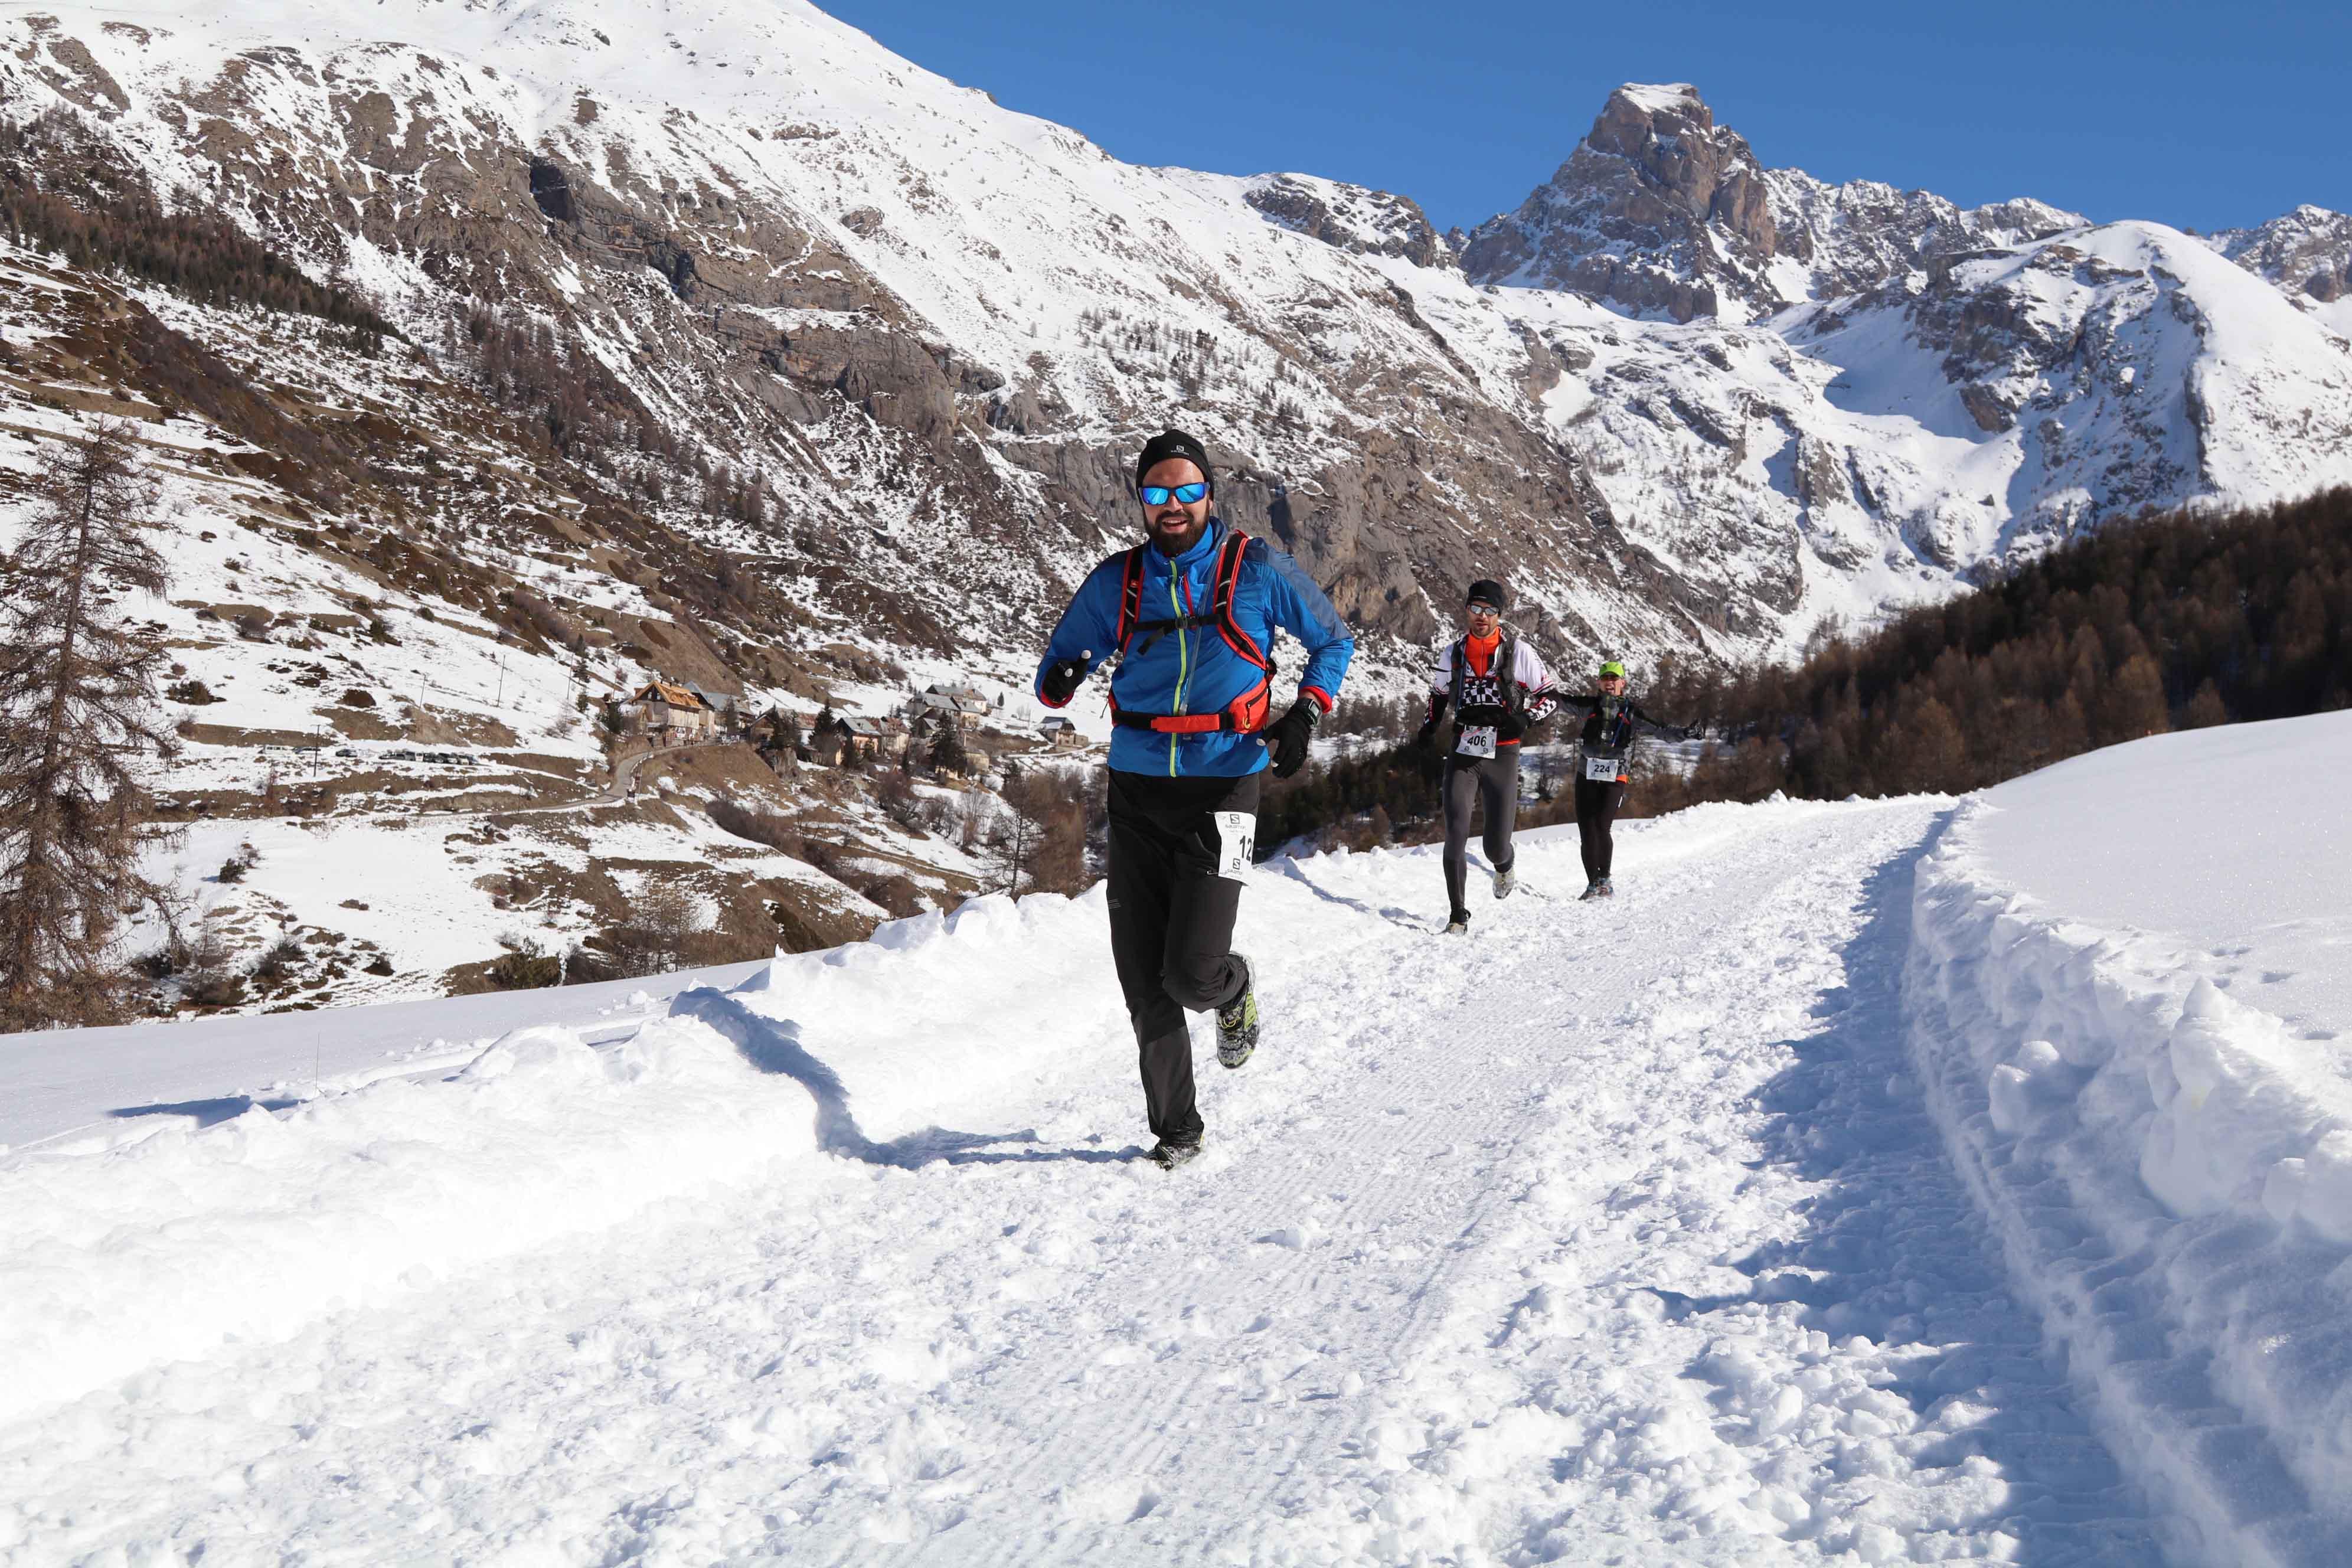 Ambiance 2017 Ubaye Trail Salomon photo Robert Goin - UBAYE SNOW TRAIL SALOMON UNE 8EME EDITION FORT REUSSIE ! 19-02-2017 RESULTATS ET VIDEO